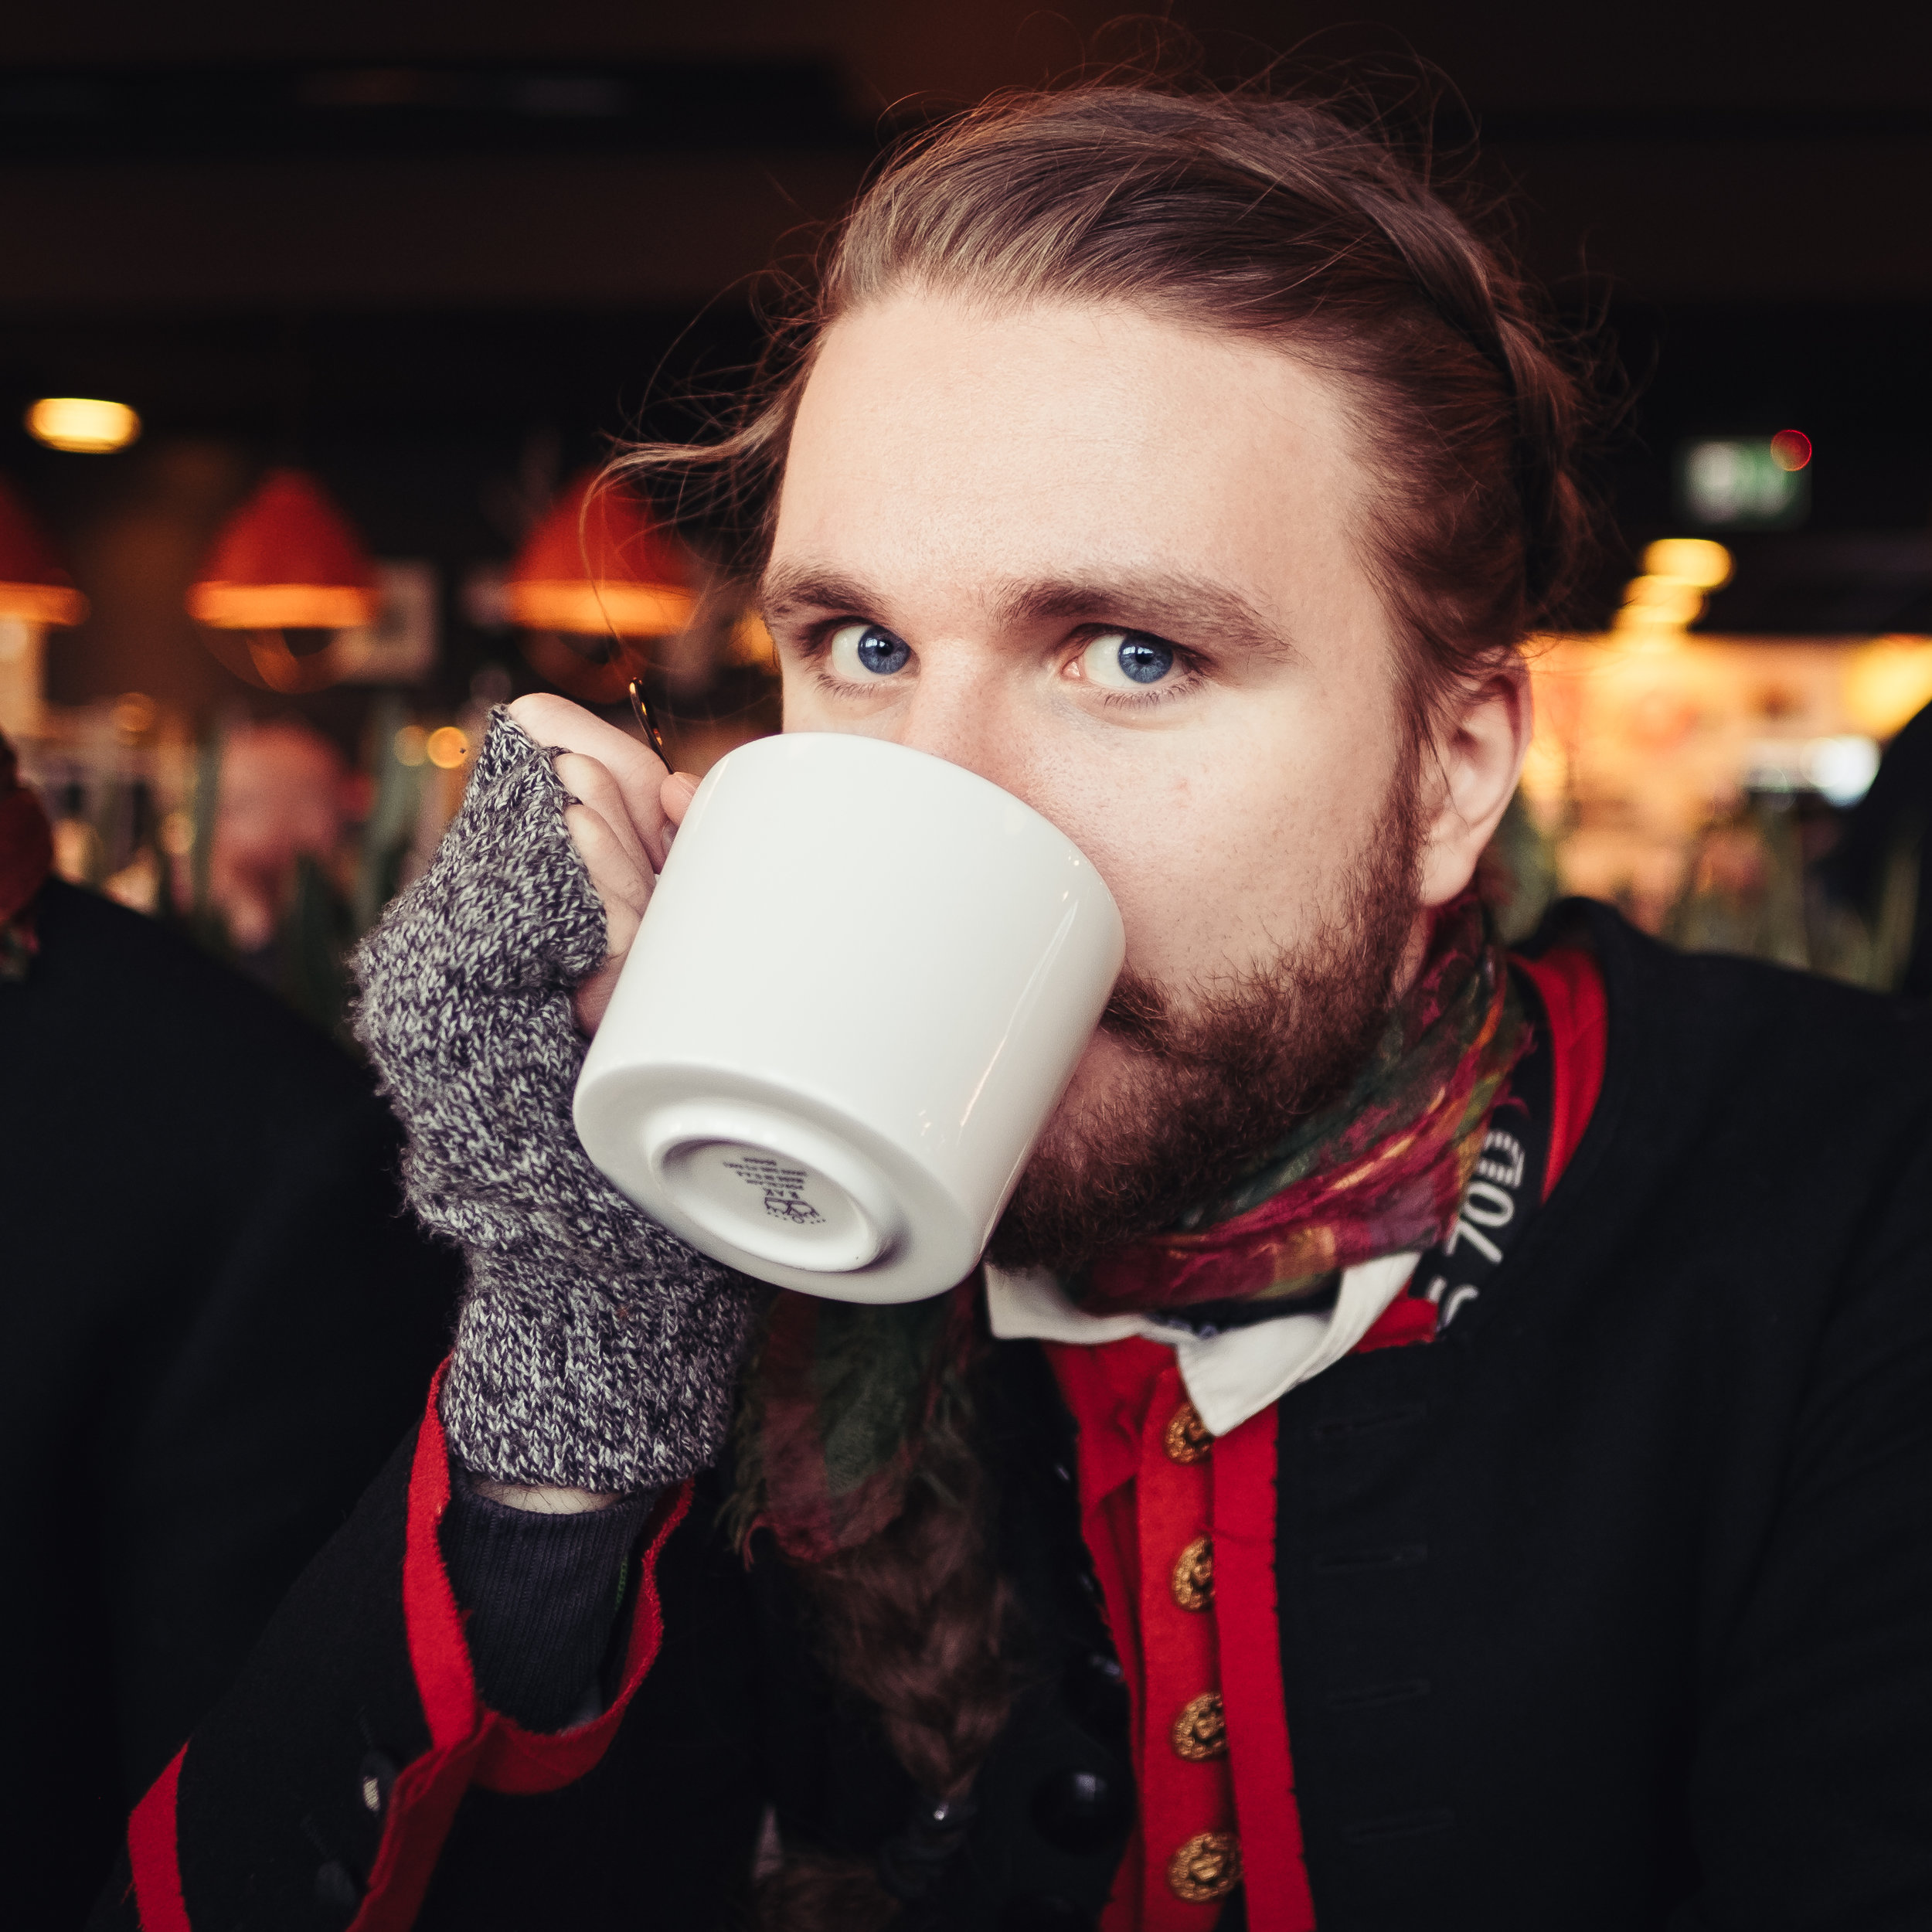 Carl Öst Wilkens - Fotograf & Programmerare